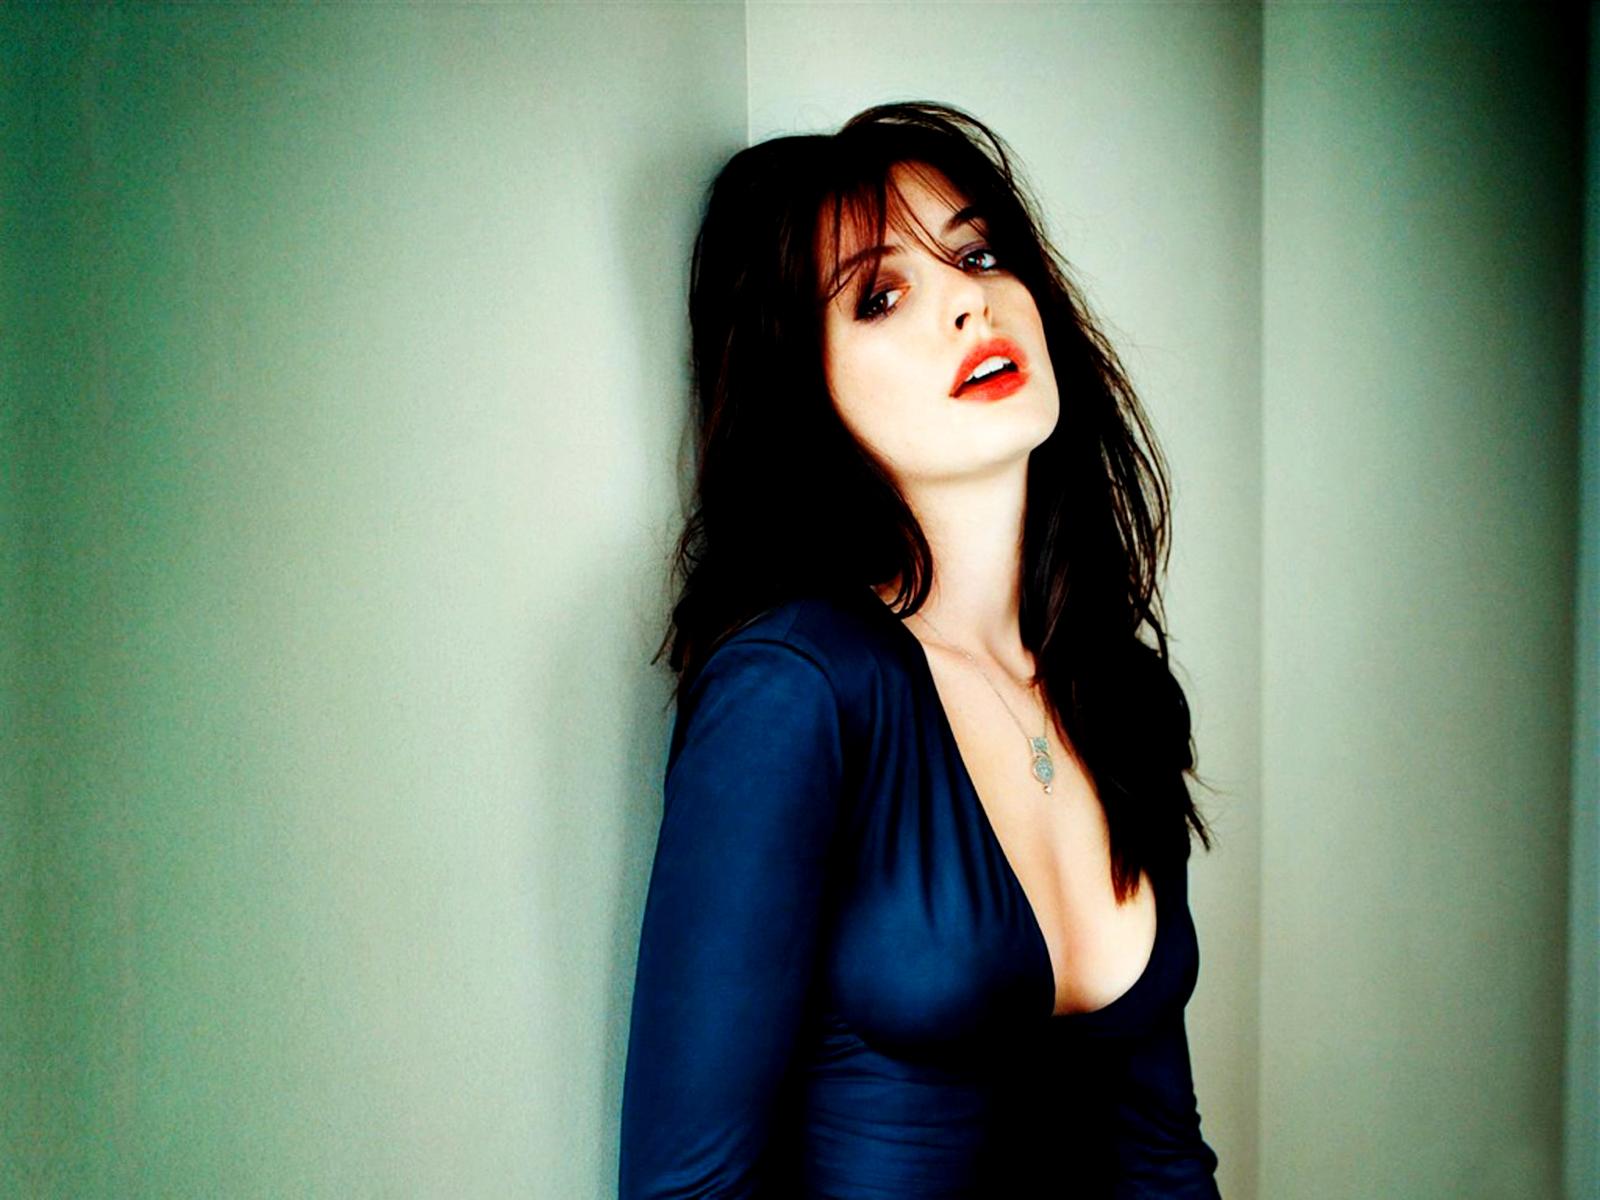 Anne Hathaway Dark Knight Rises HD Wallpapers | Desktop Wallpapers